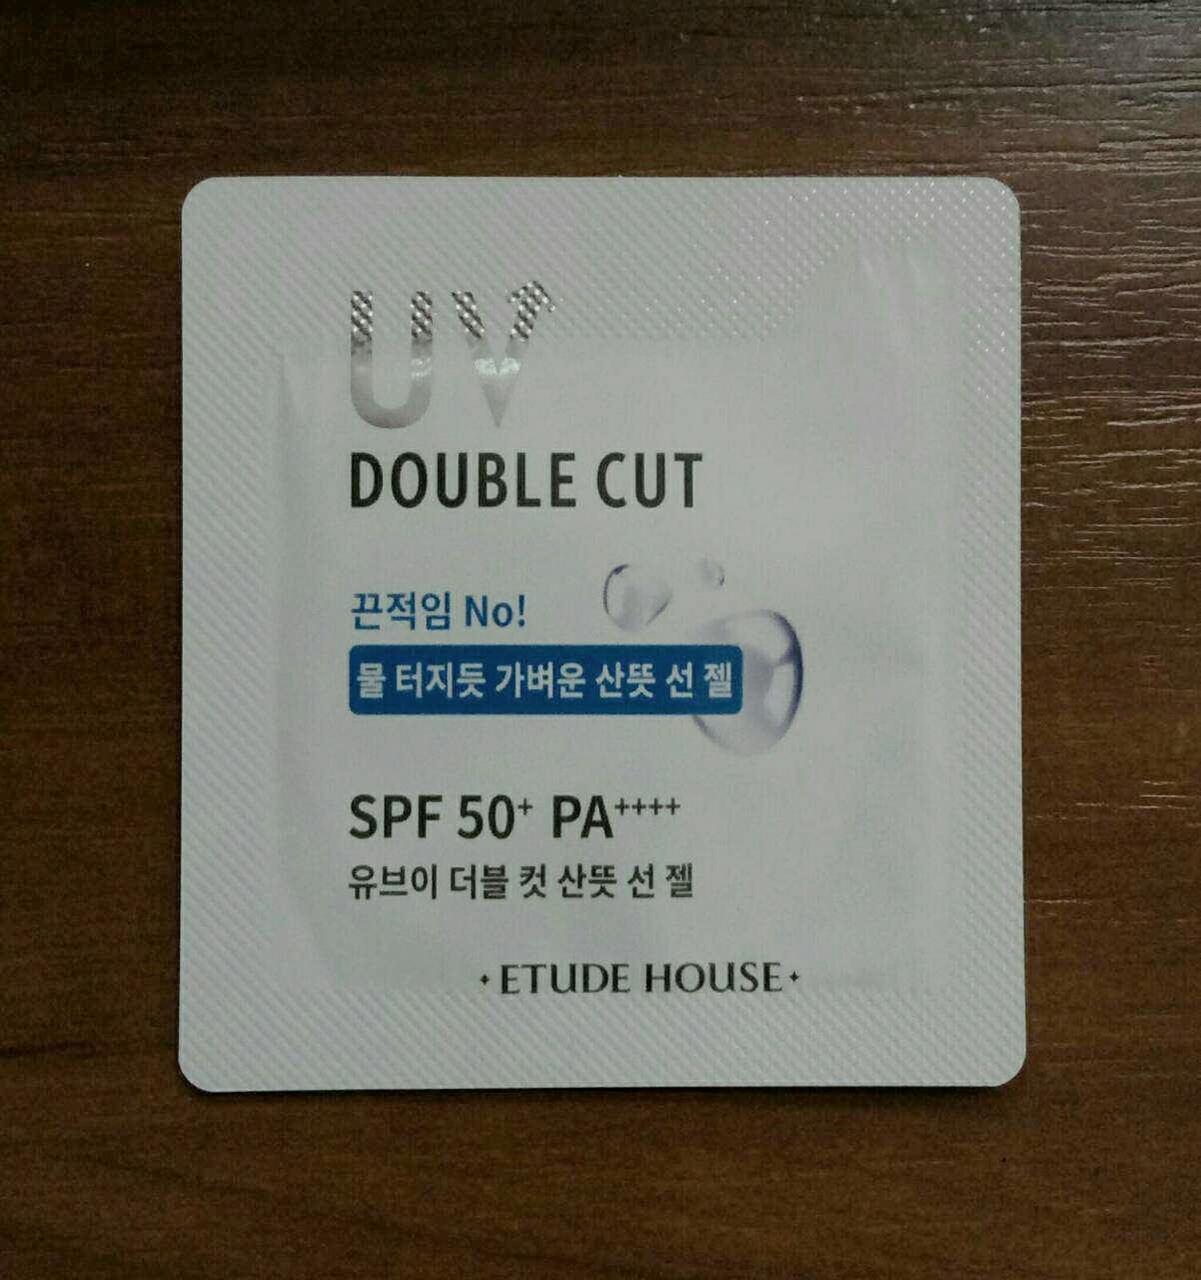 Солнцезащитный крем-гель Etude House UV Double Cut Fresh Sun Gel SPF50+ PA++++, пробник